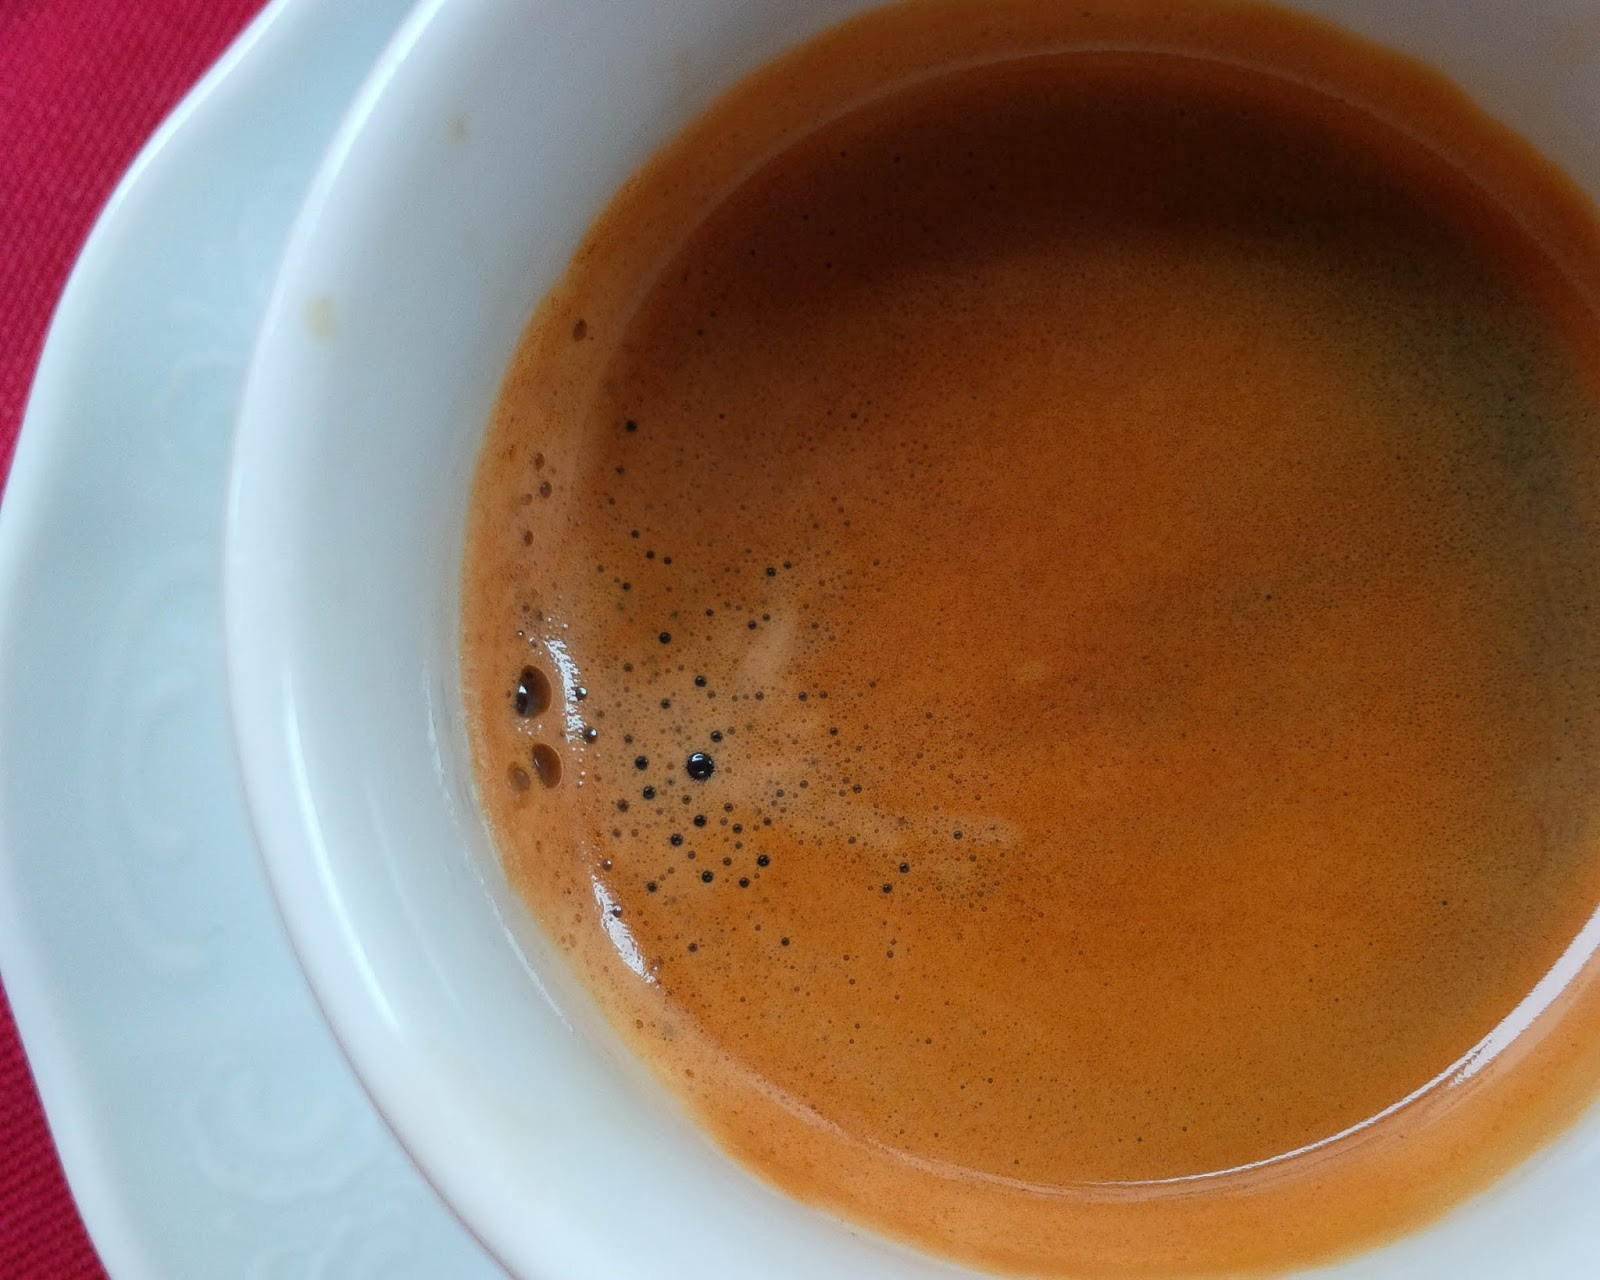 A cup of proper Italian espresso